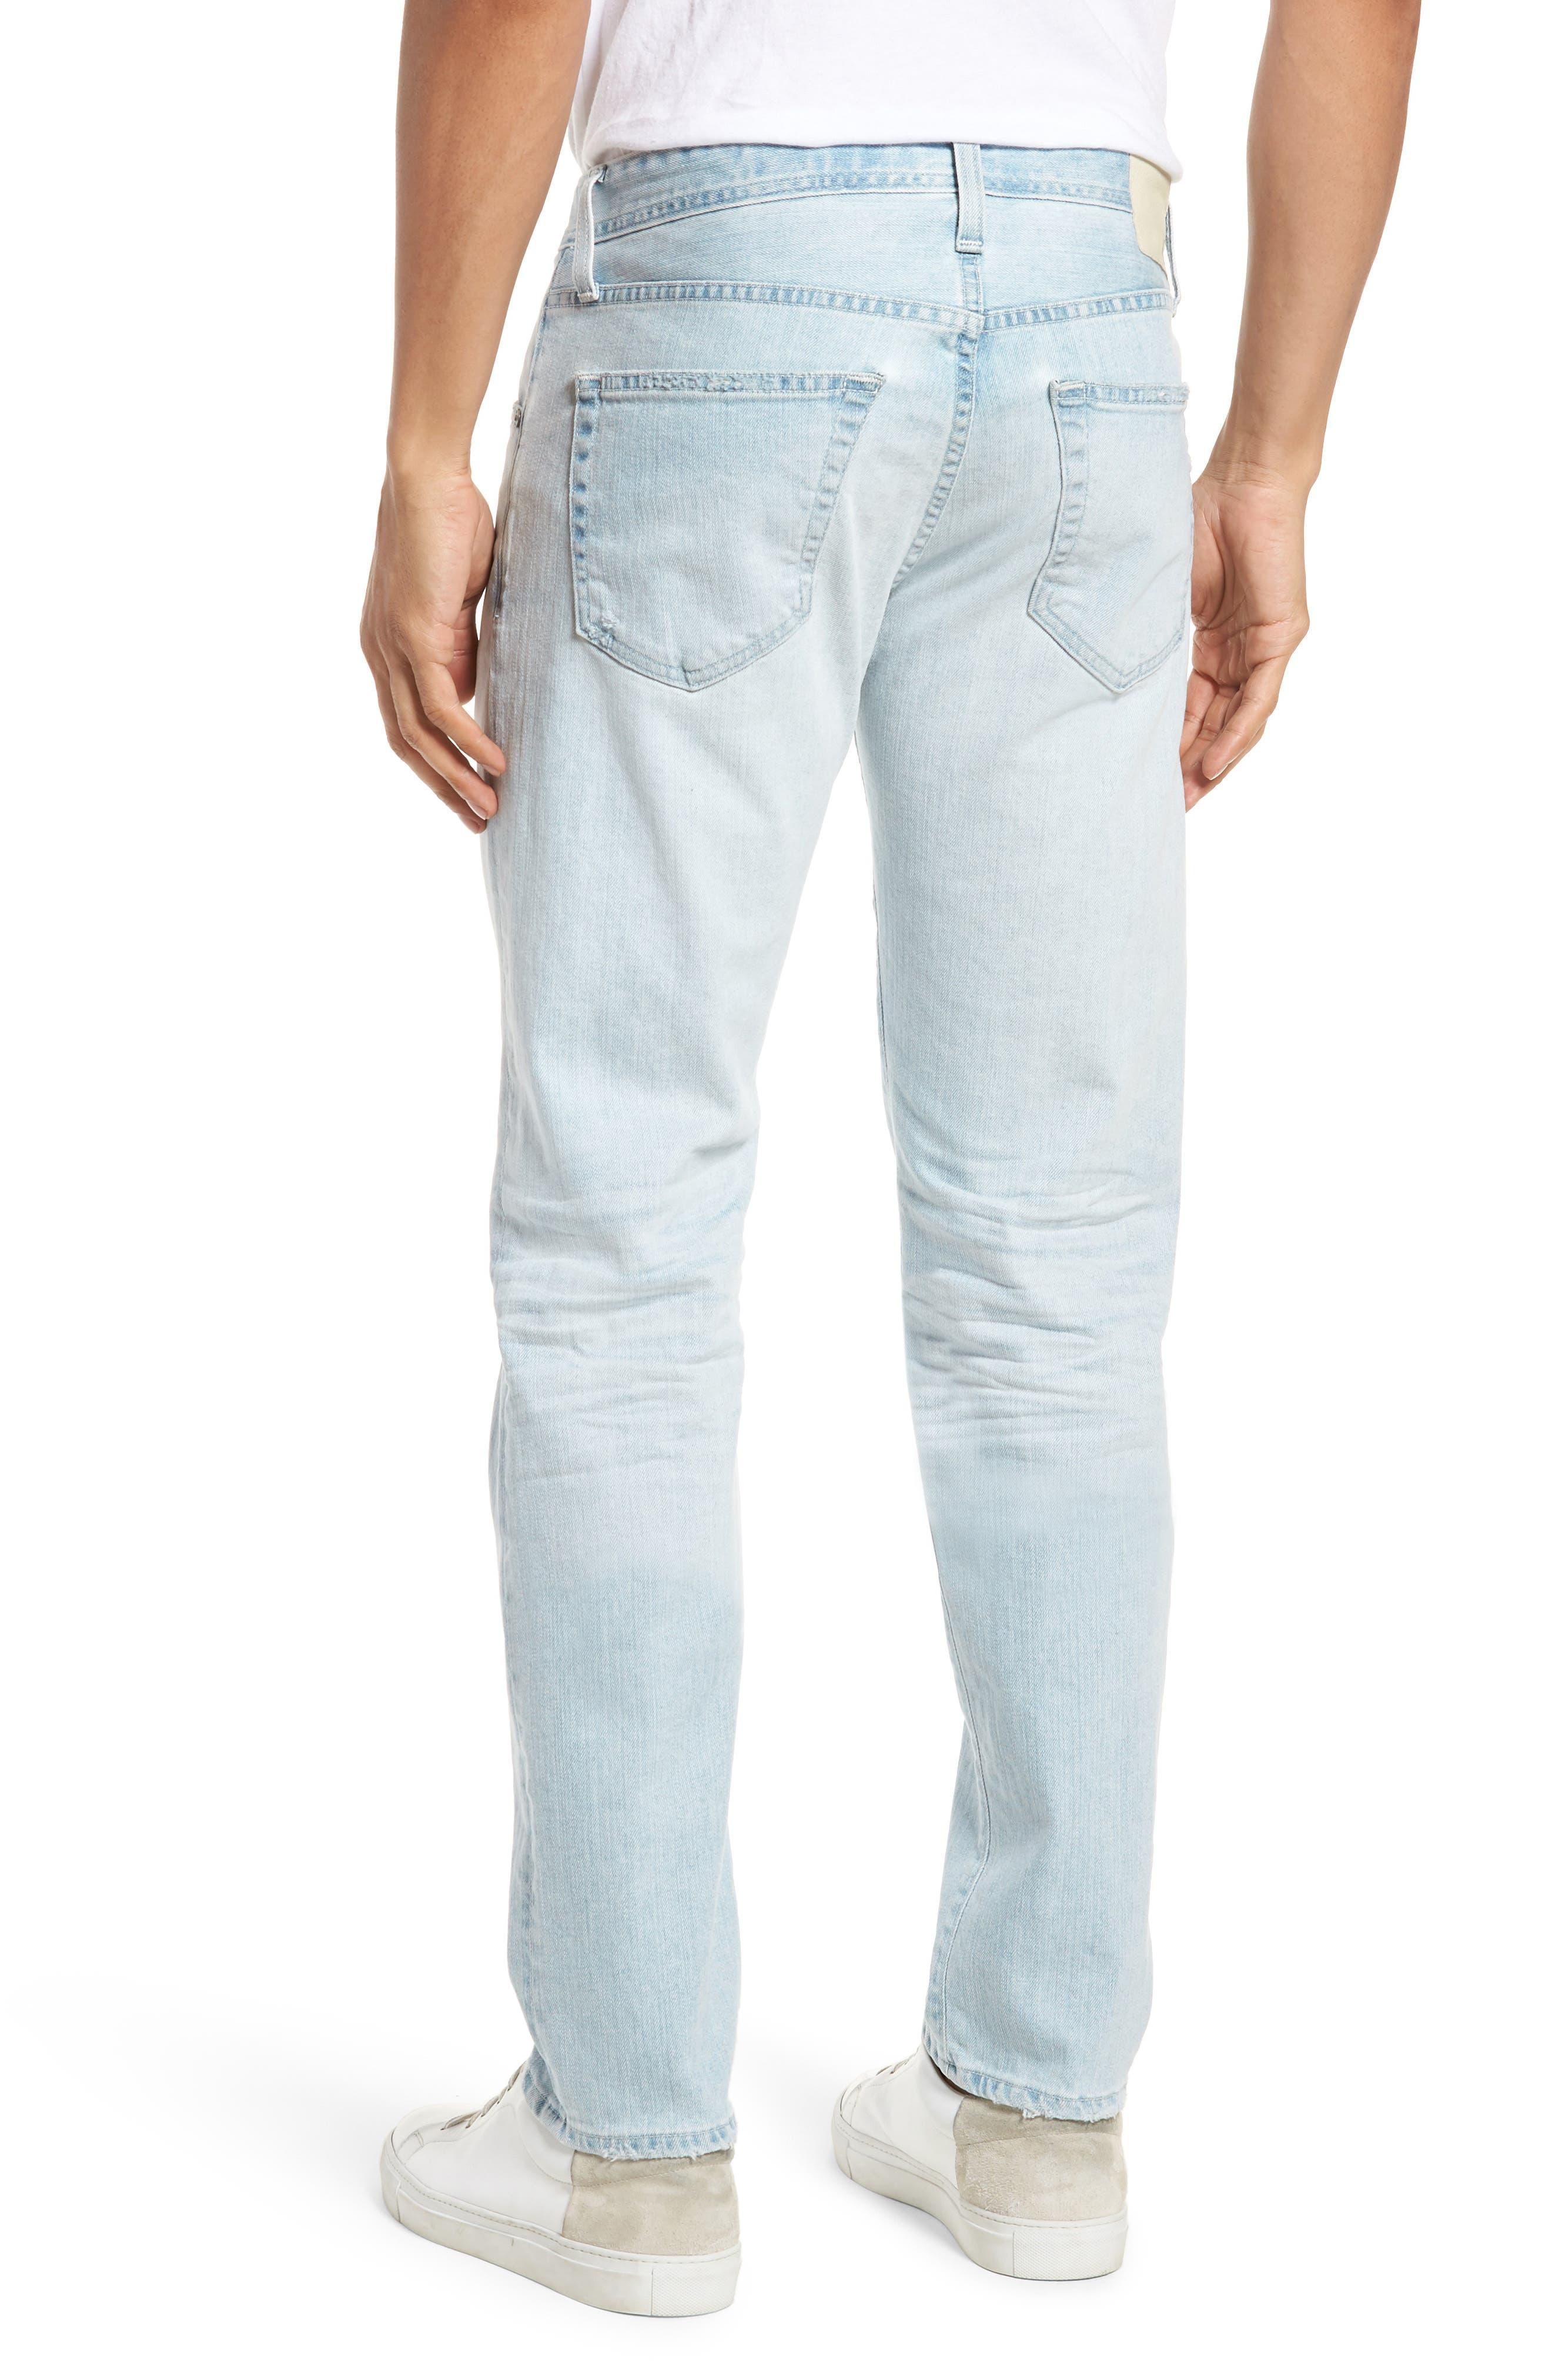 Tellis Slim Fit Jeans,                             Alternate thumbnail 2, color,                             27 Years Surfrider